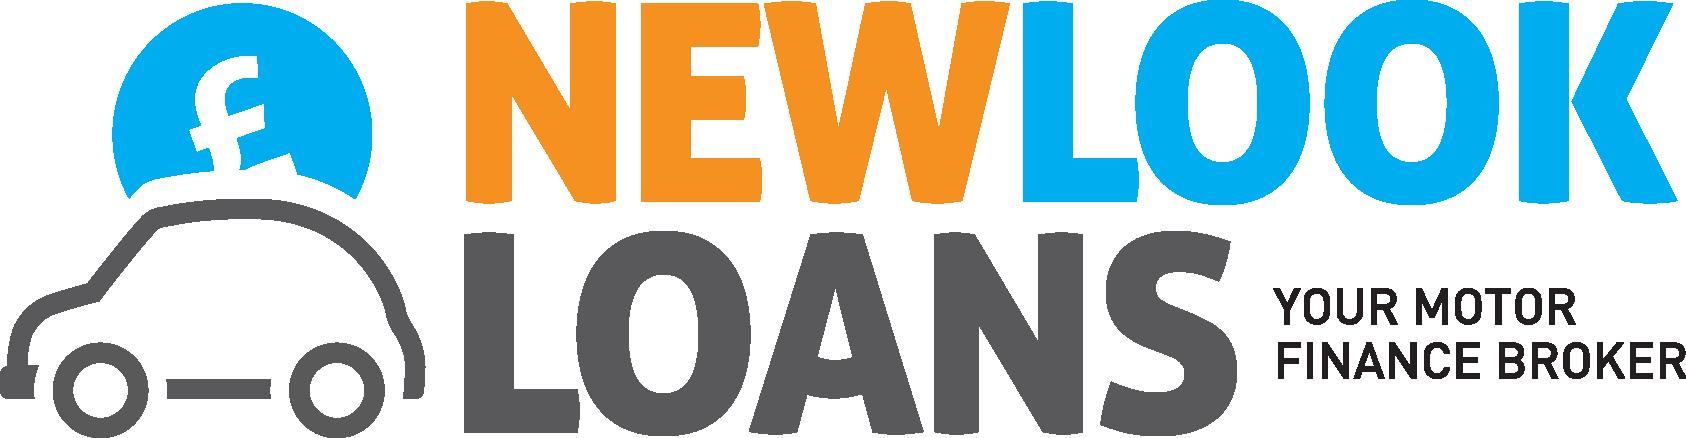 New Look Loans